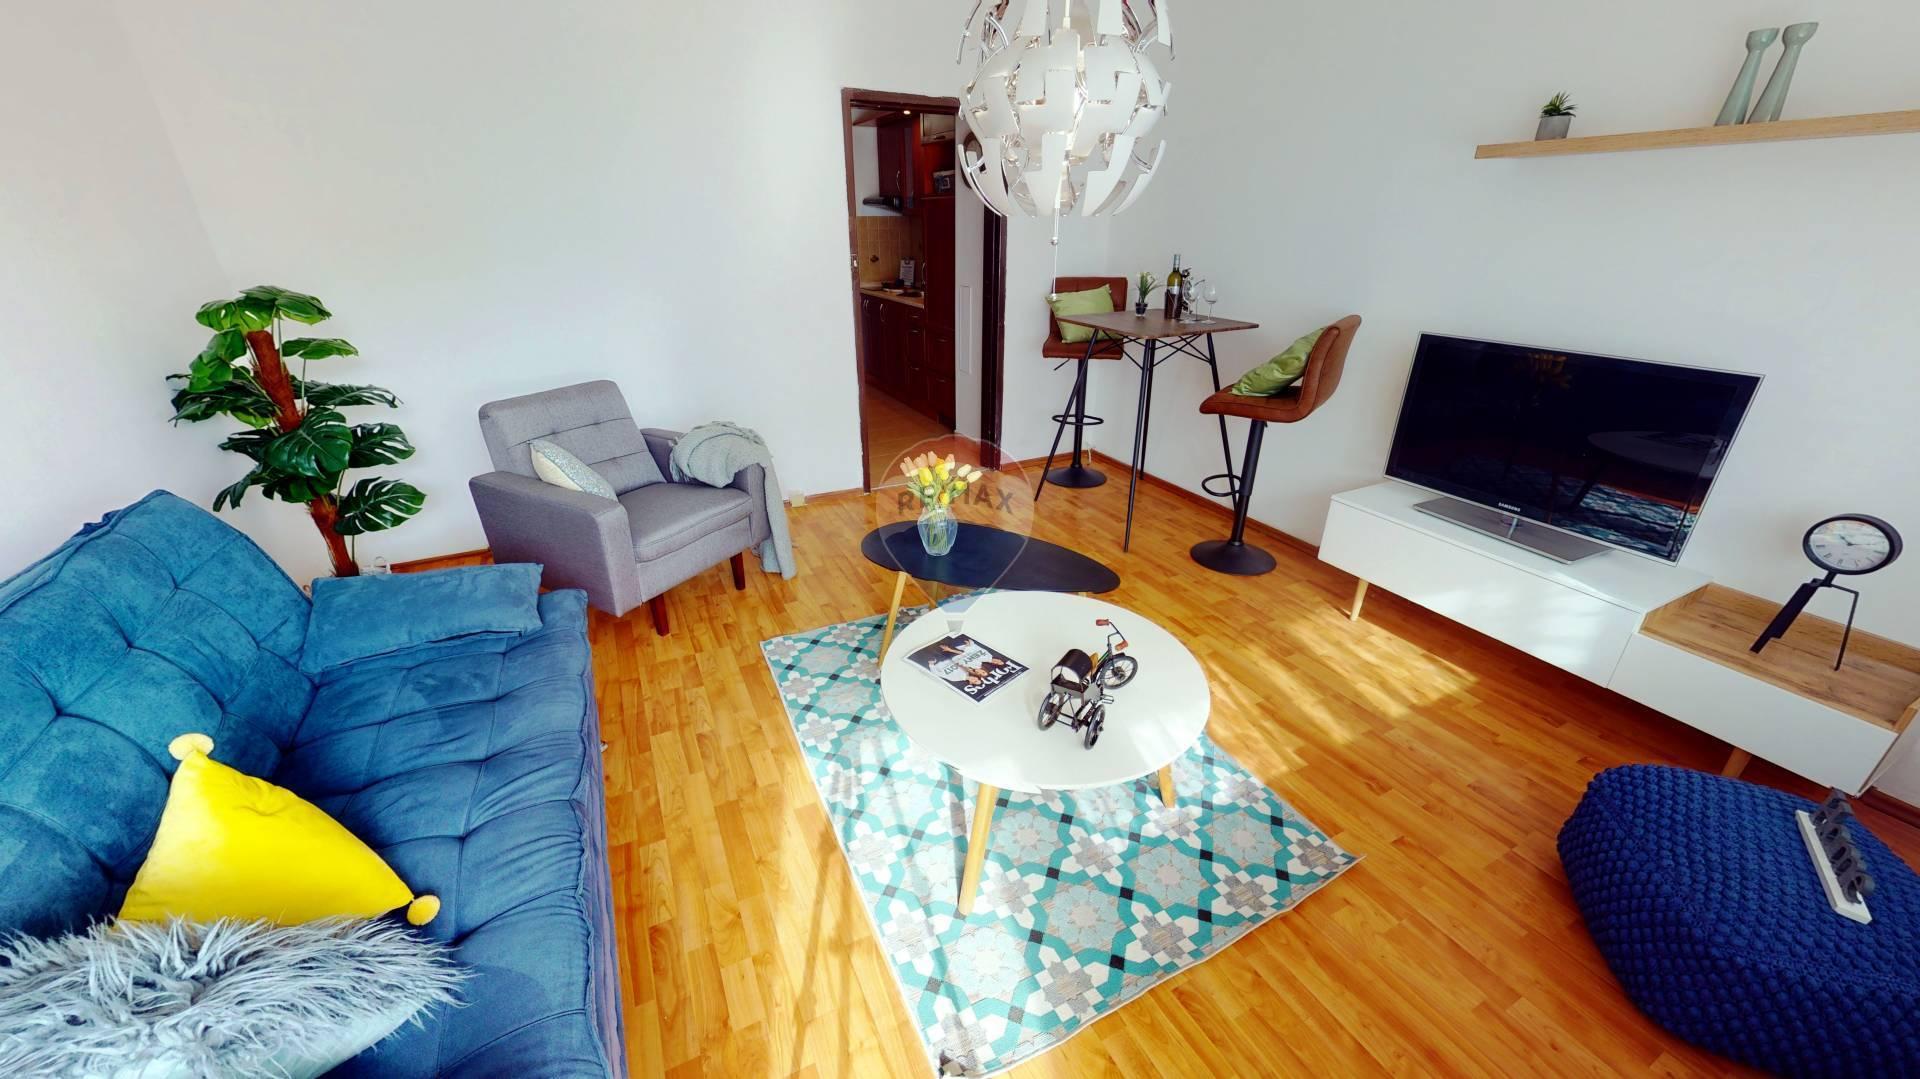 Predaj bytu (garsónka) 34 m2, Bratislava - Petržalka -